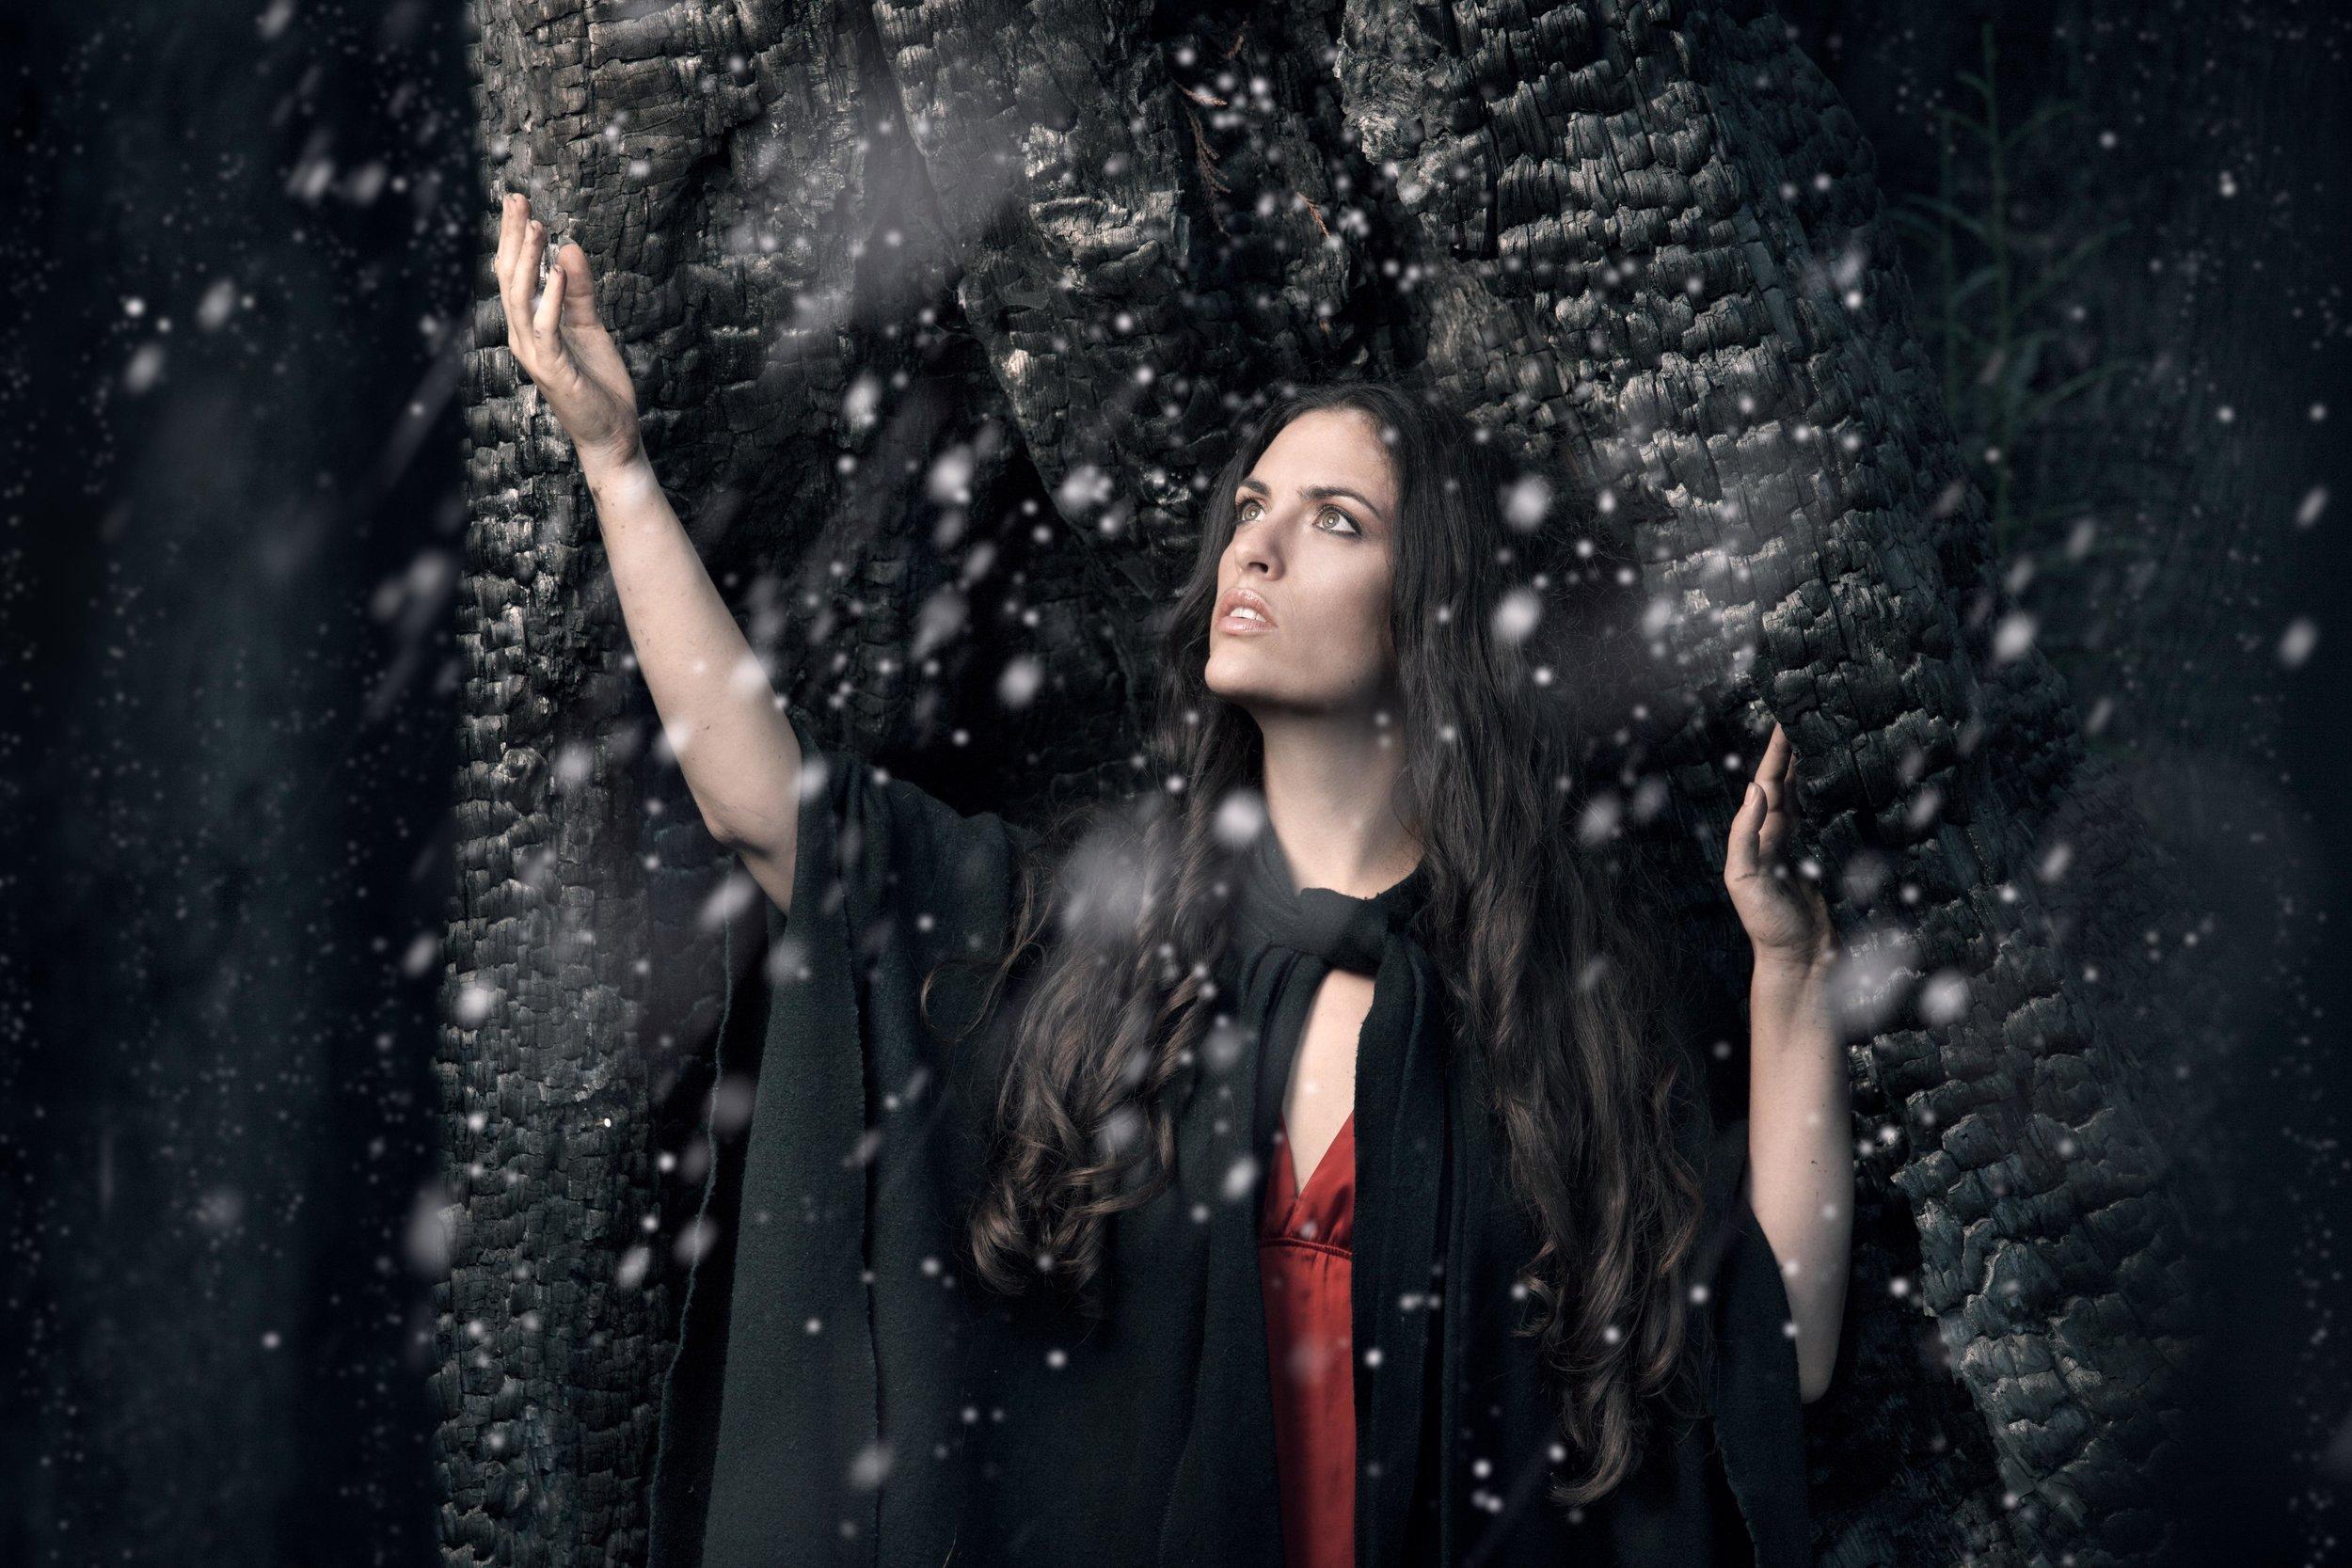 Marya_stark_snow_angel_photography_composite_winter_muse.jpg